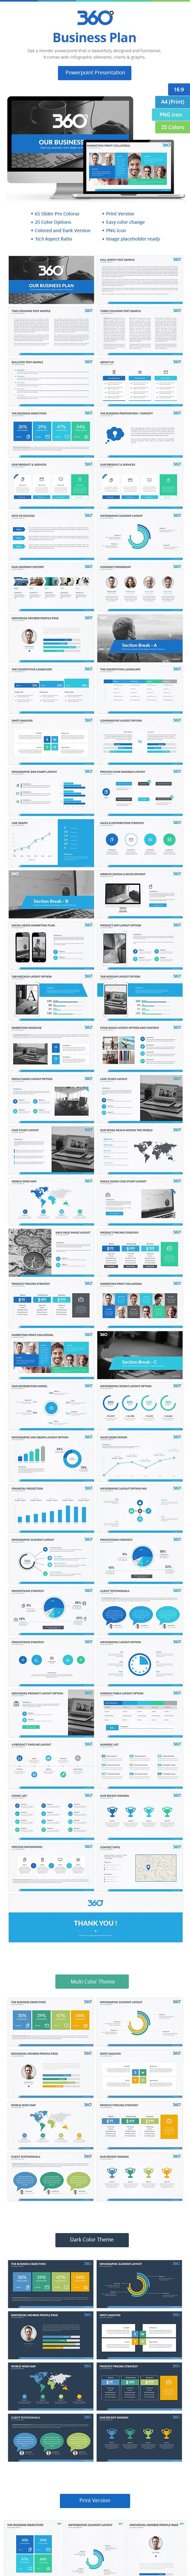 360 Business Plan Powerpoint Template - PowerPoint Templates Presentation Templates